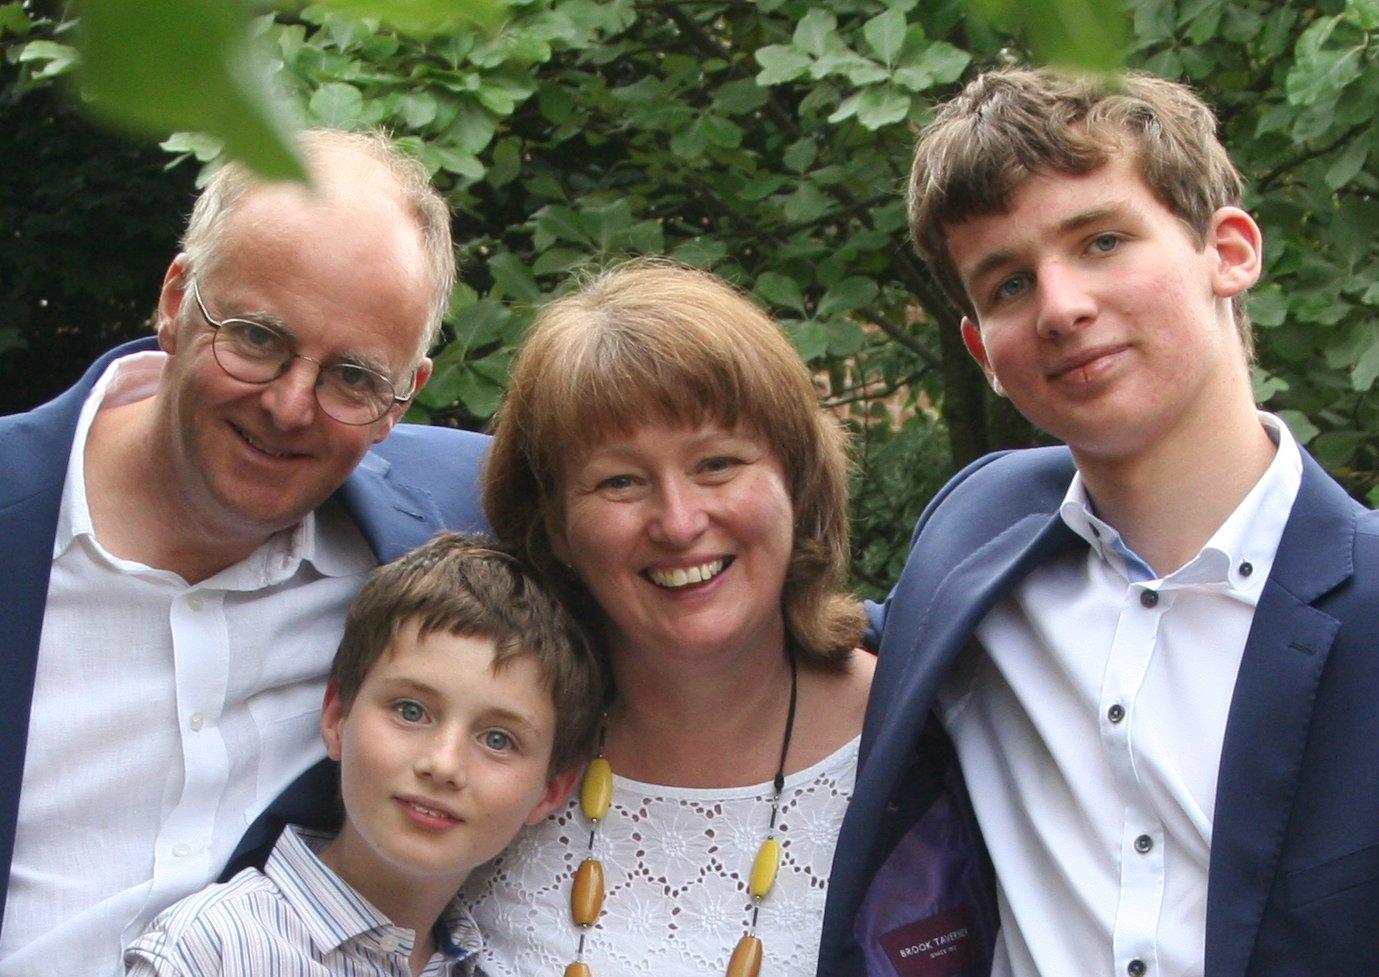 The Blakemore family